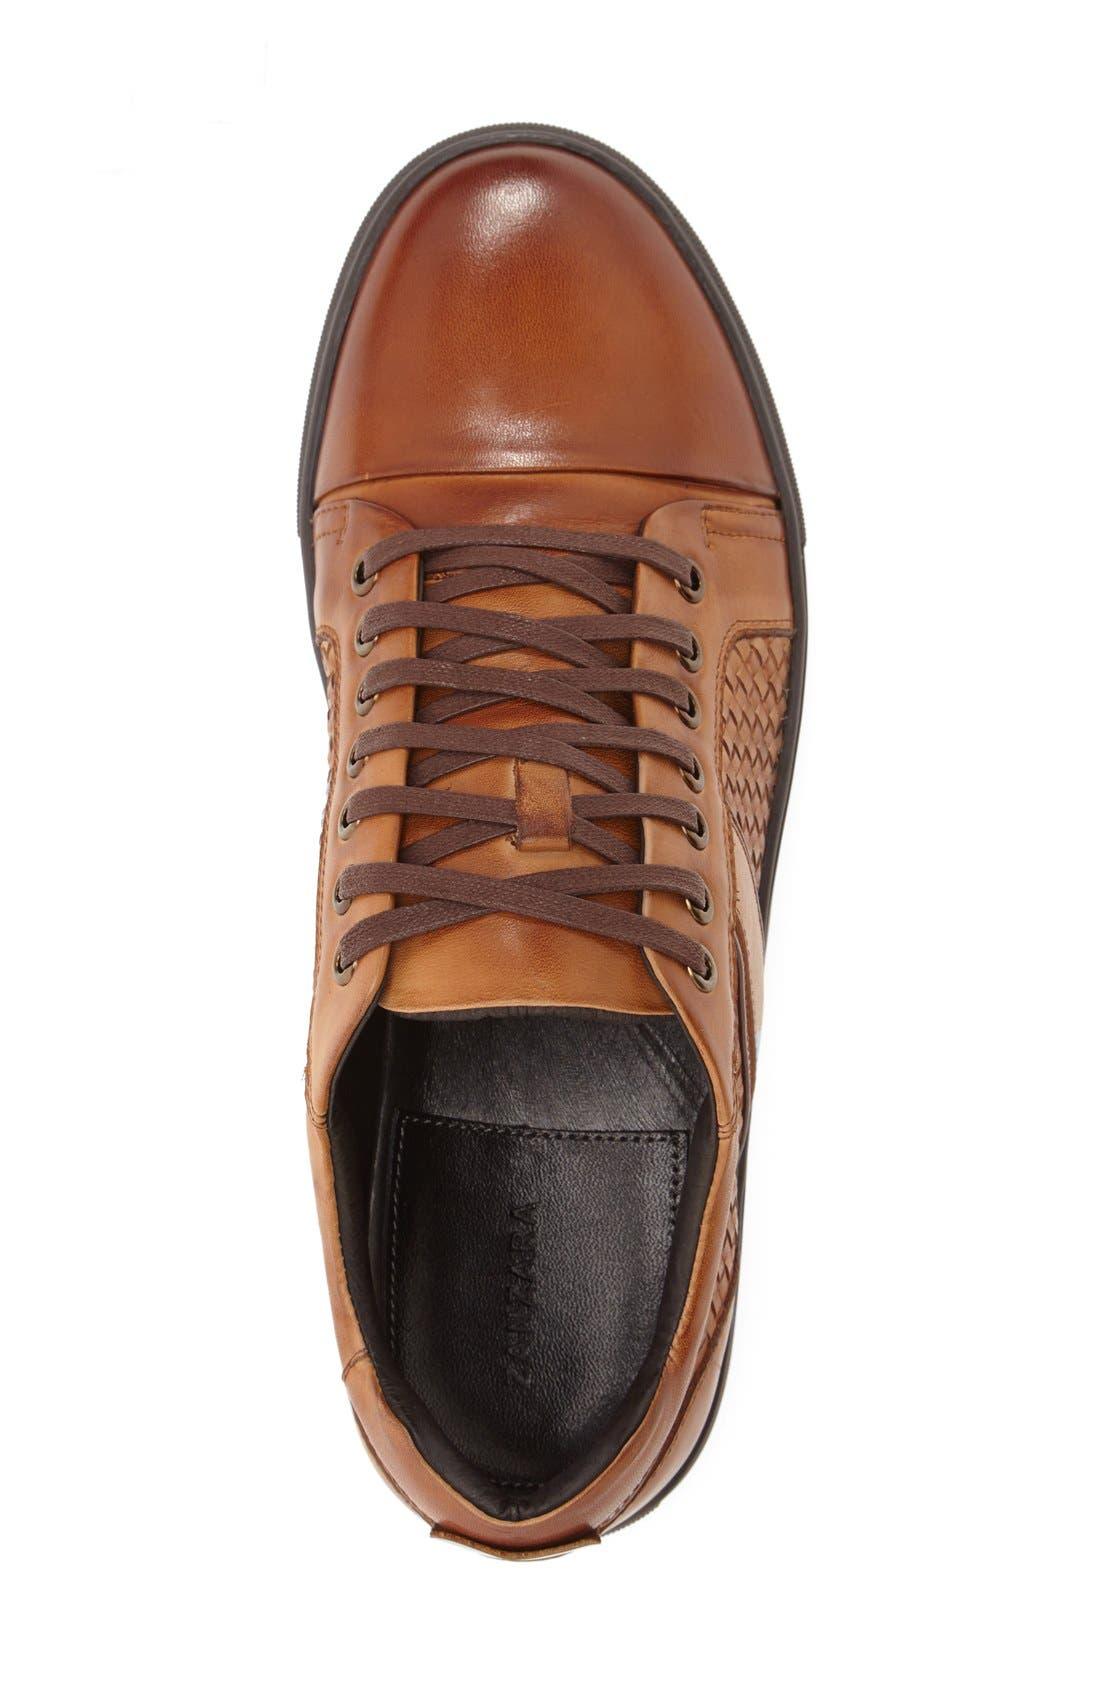 Alternate Image 3  - Zanzara 'Rhythm' Woven Sneaker (Men)